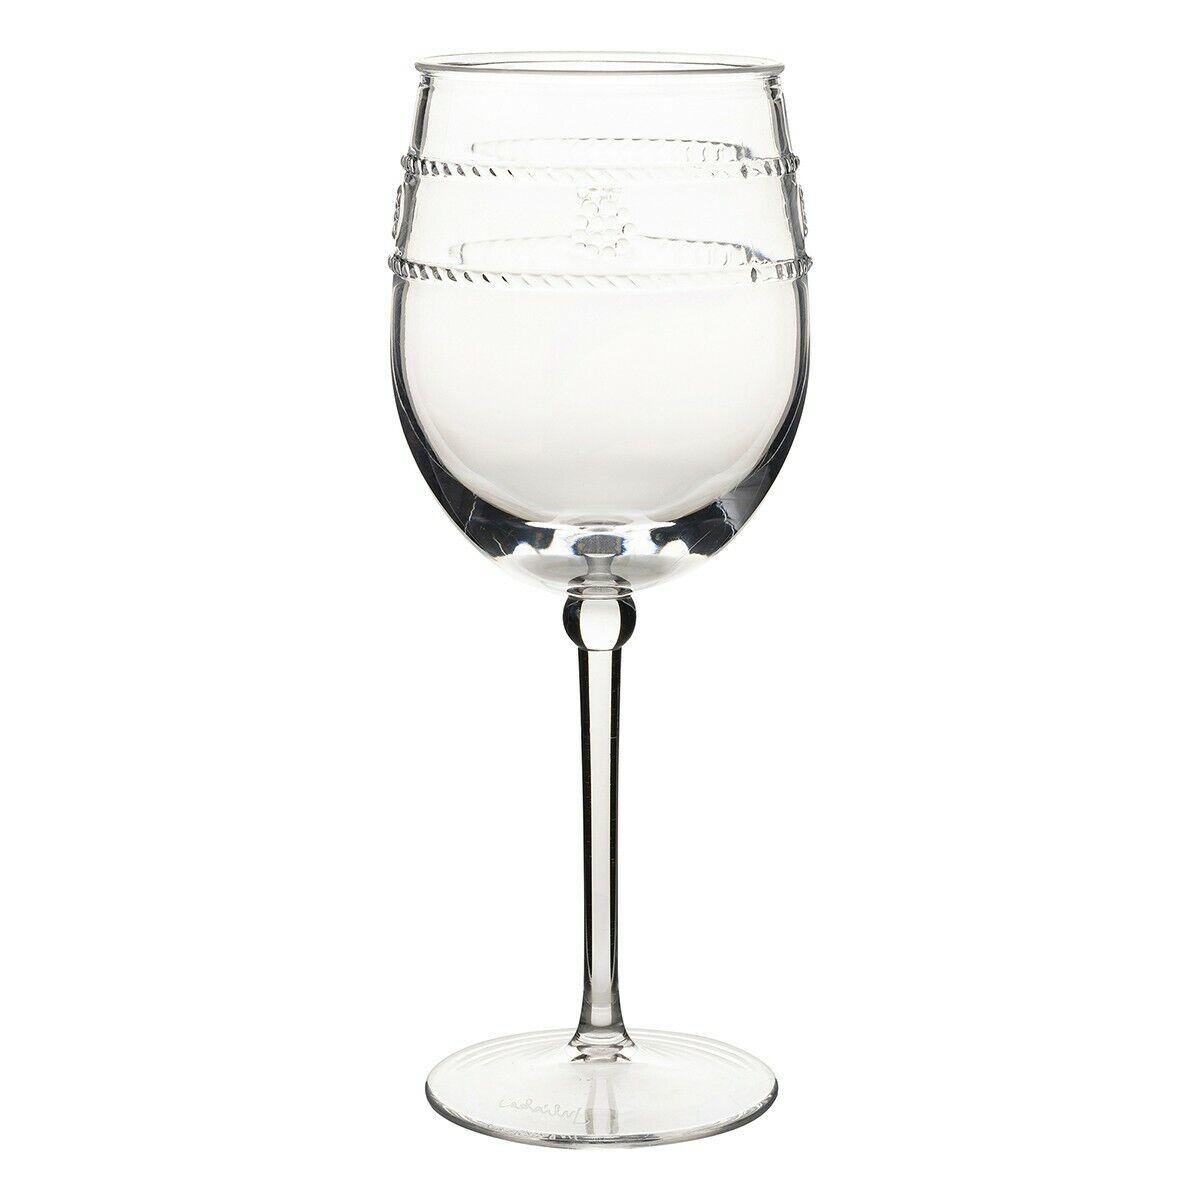 Juliska Isabella Acrylique Verre Vin-Set de 8